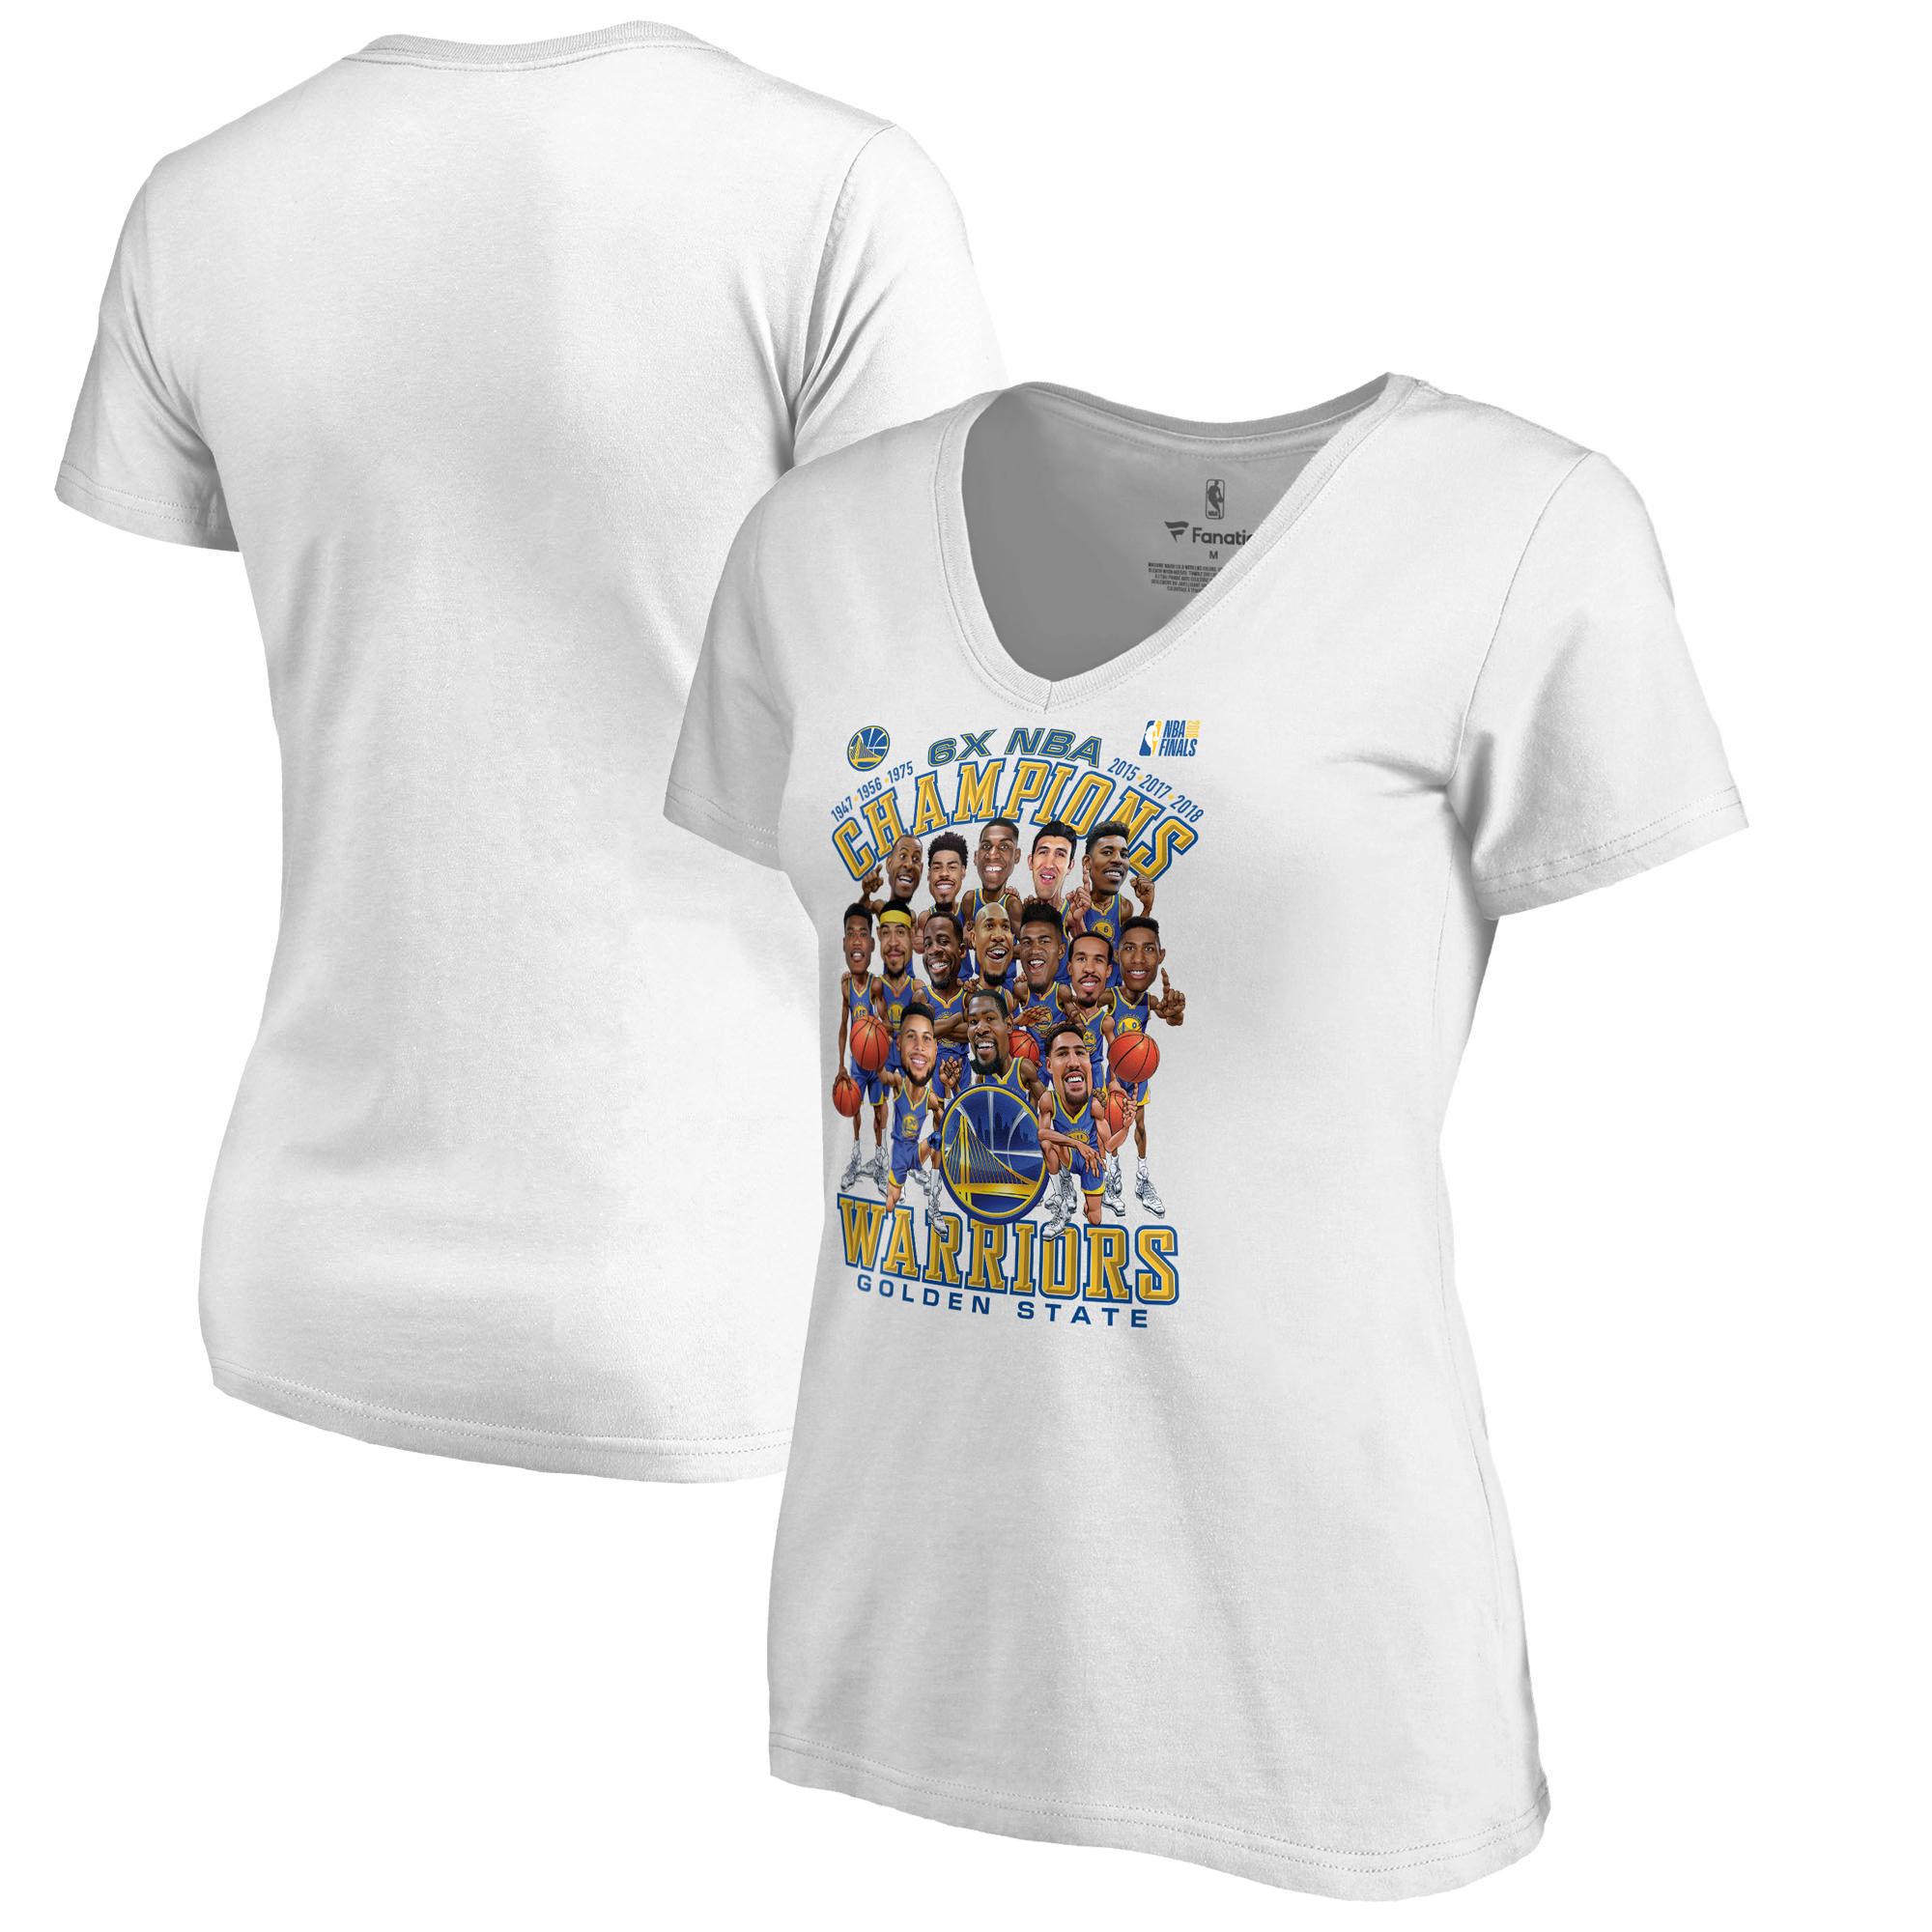 Golden State Warriors Fanatics Branded Women's 2018 NBA Finals Champions Caricature T-Shirt - White